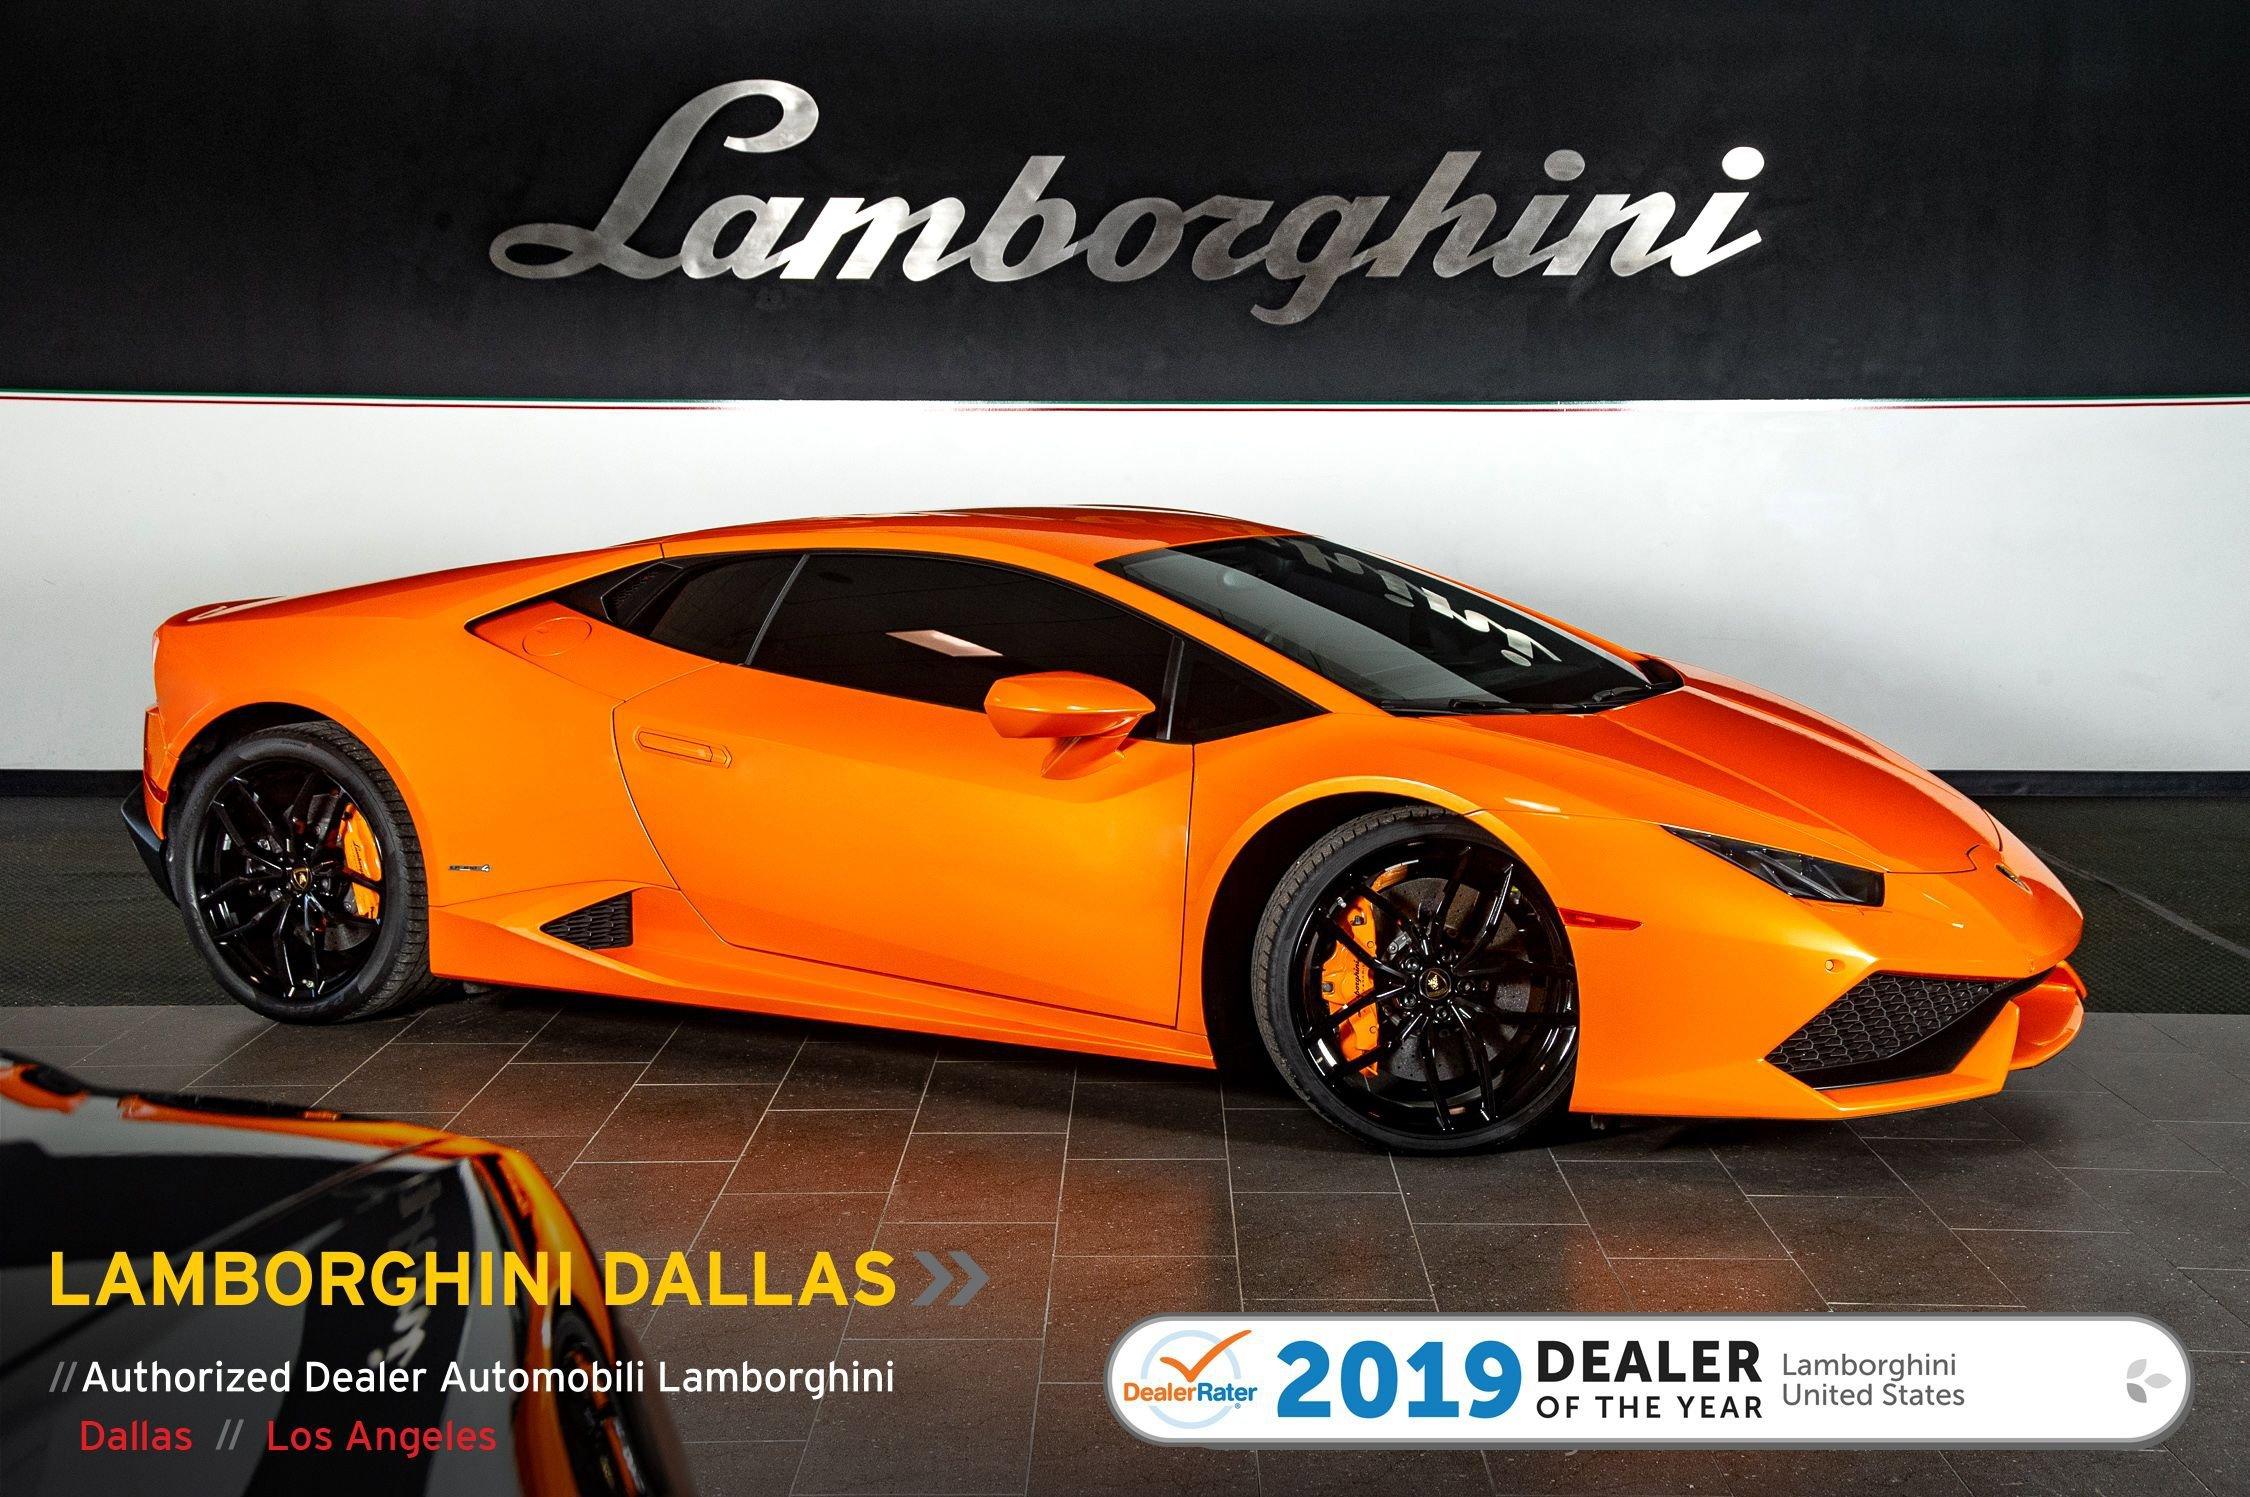 2015 Lamborghini Huracan LP 610-4 Coupe image